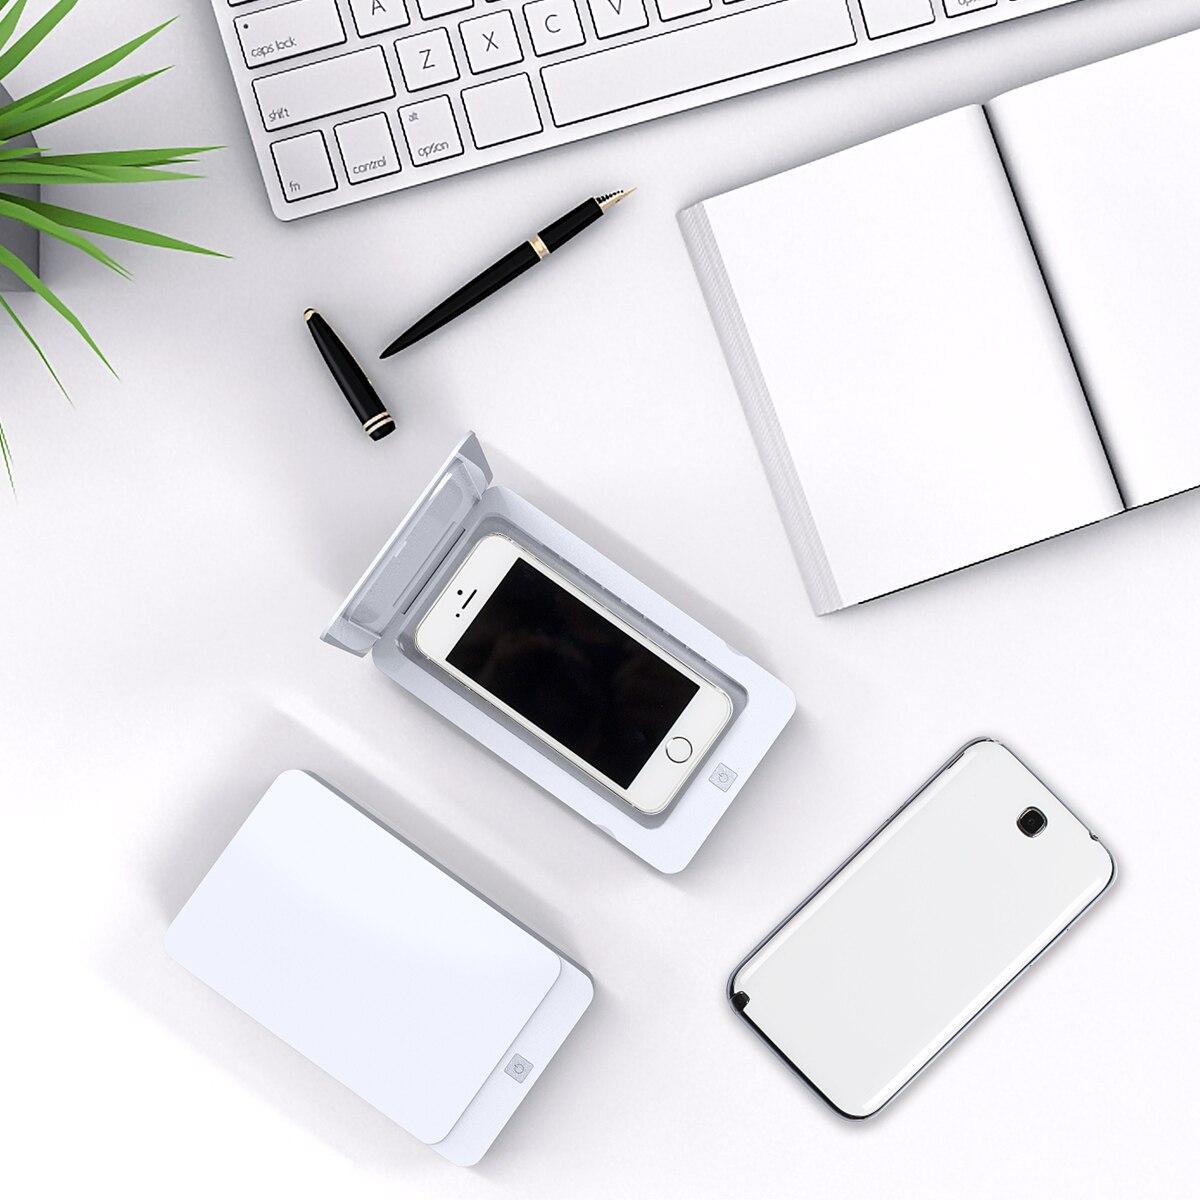 UV Cell Phone Sanitizer Disinfection Box UV Light  Sterilizer Smart Phone Sanitizer Multifunctional Portable UV Disinfector